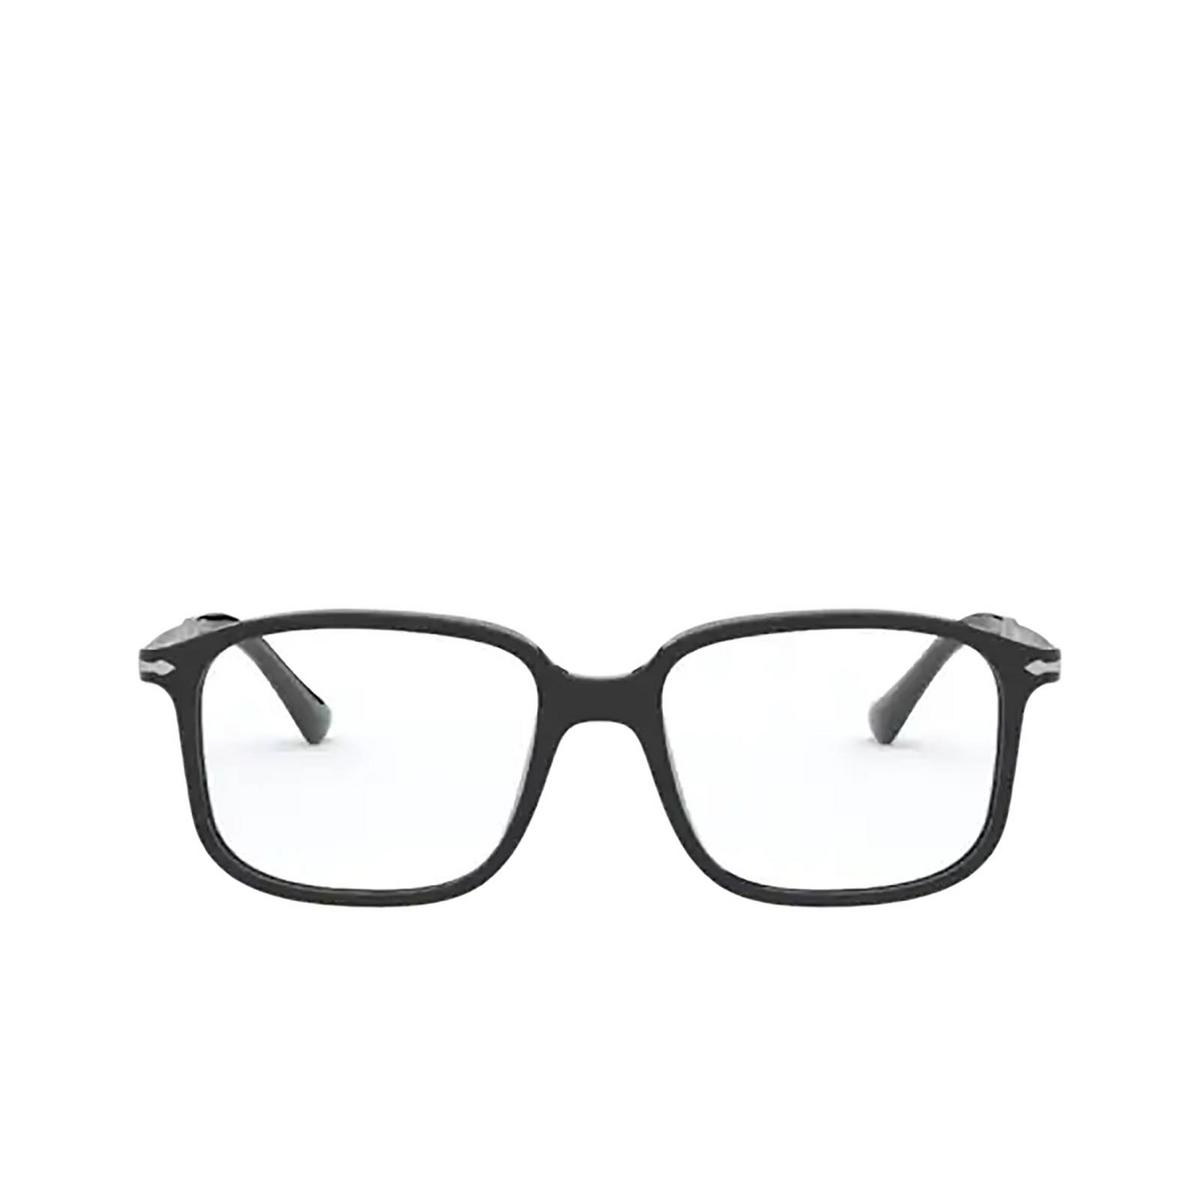 Persol® Rectangle Eyeglasses: PO3246V color Black 95 - front view.